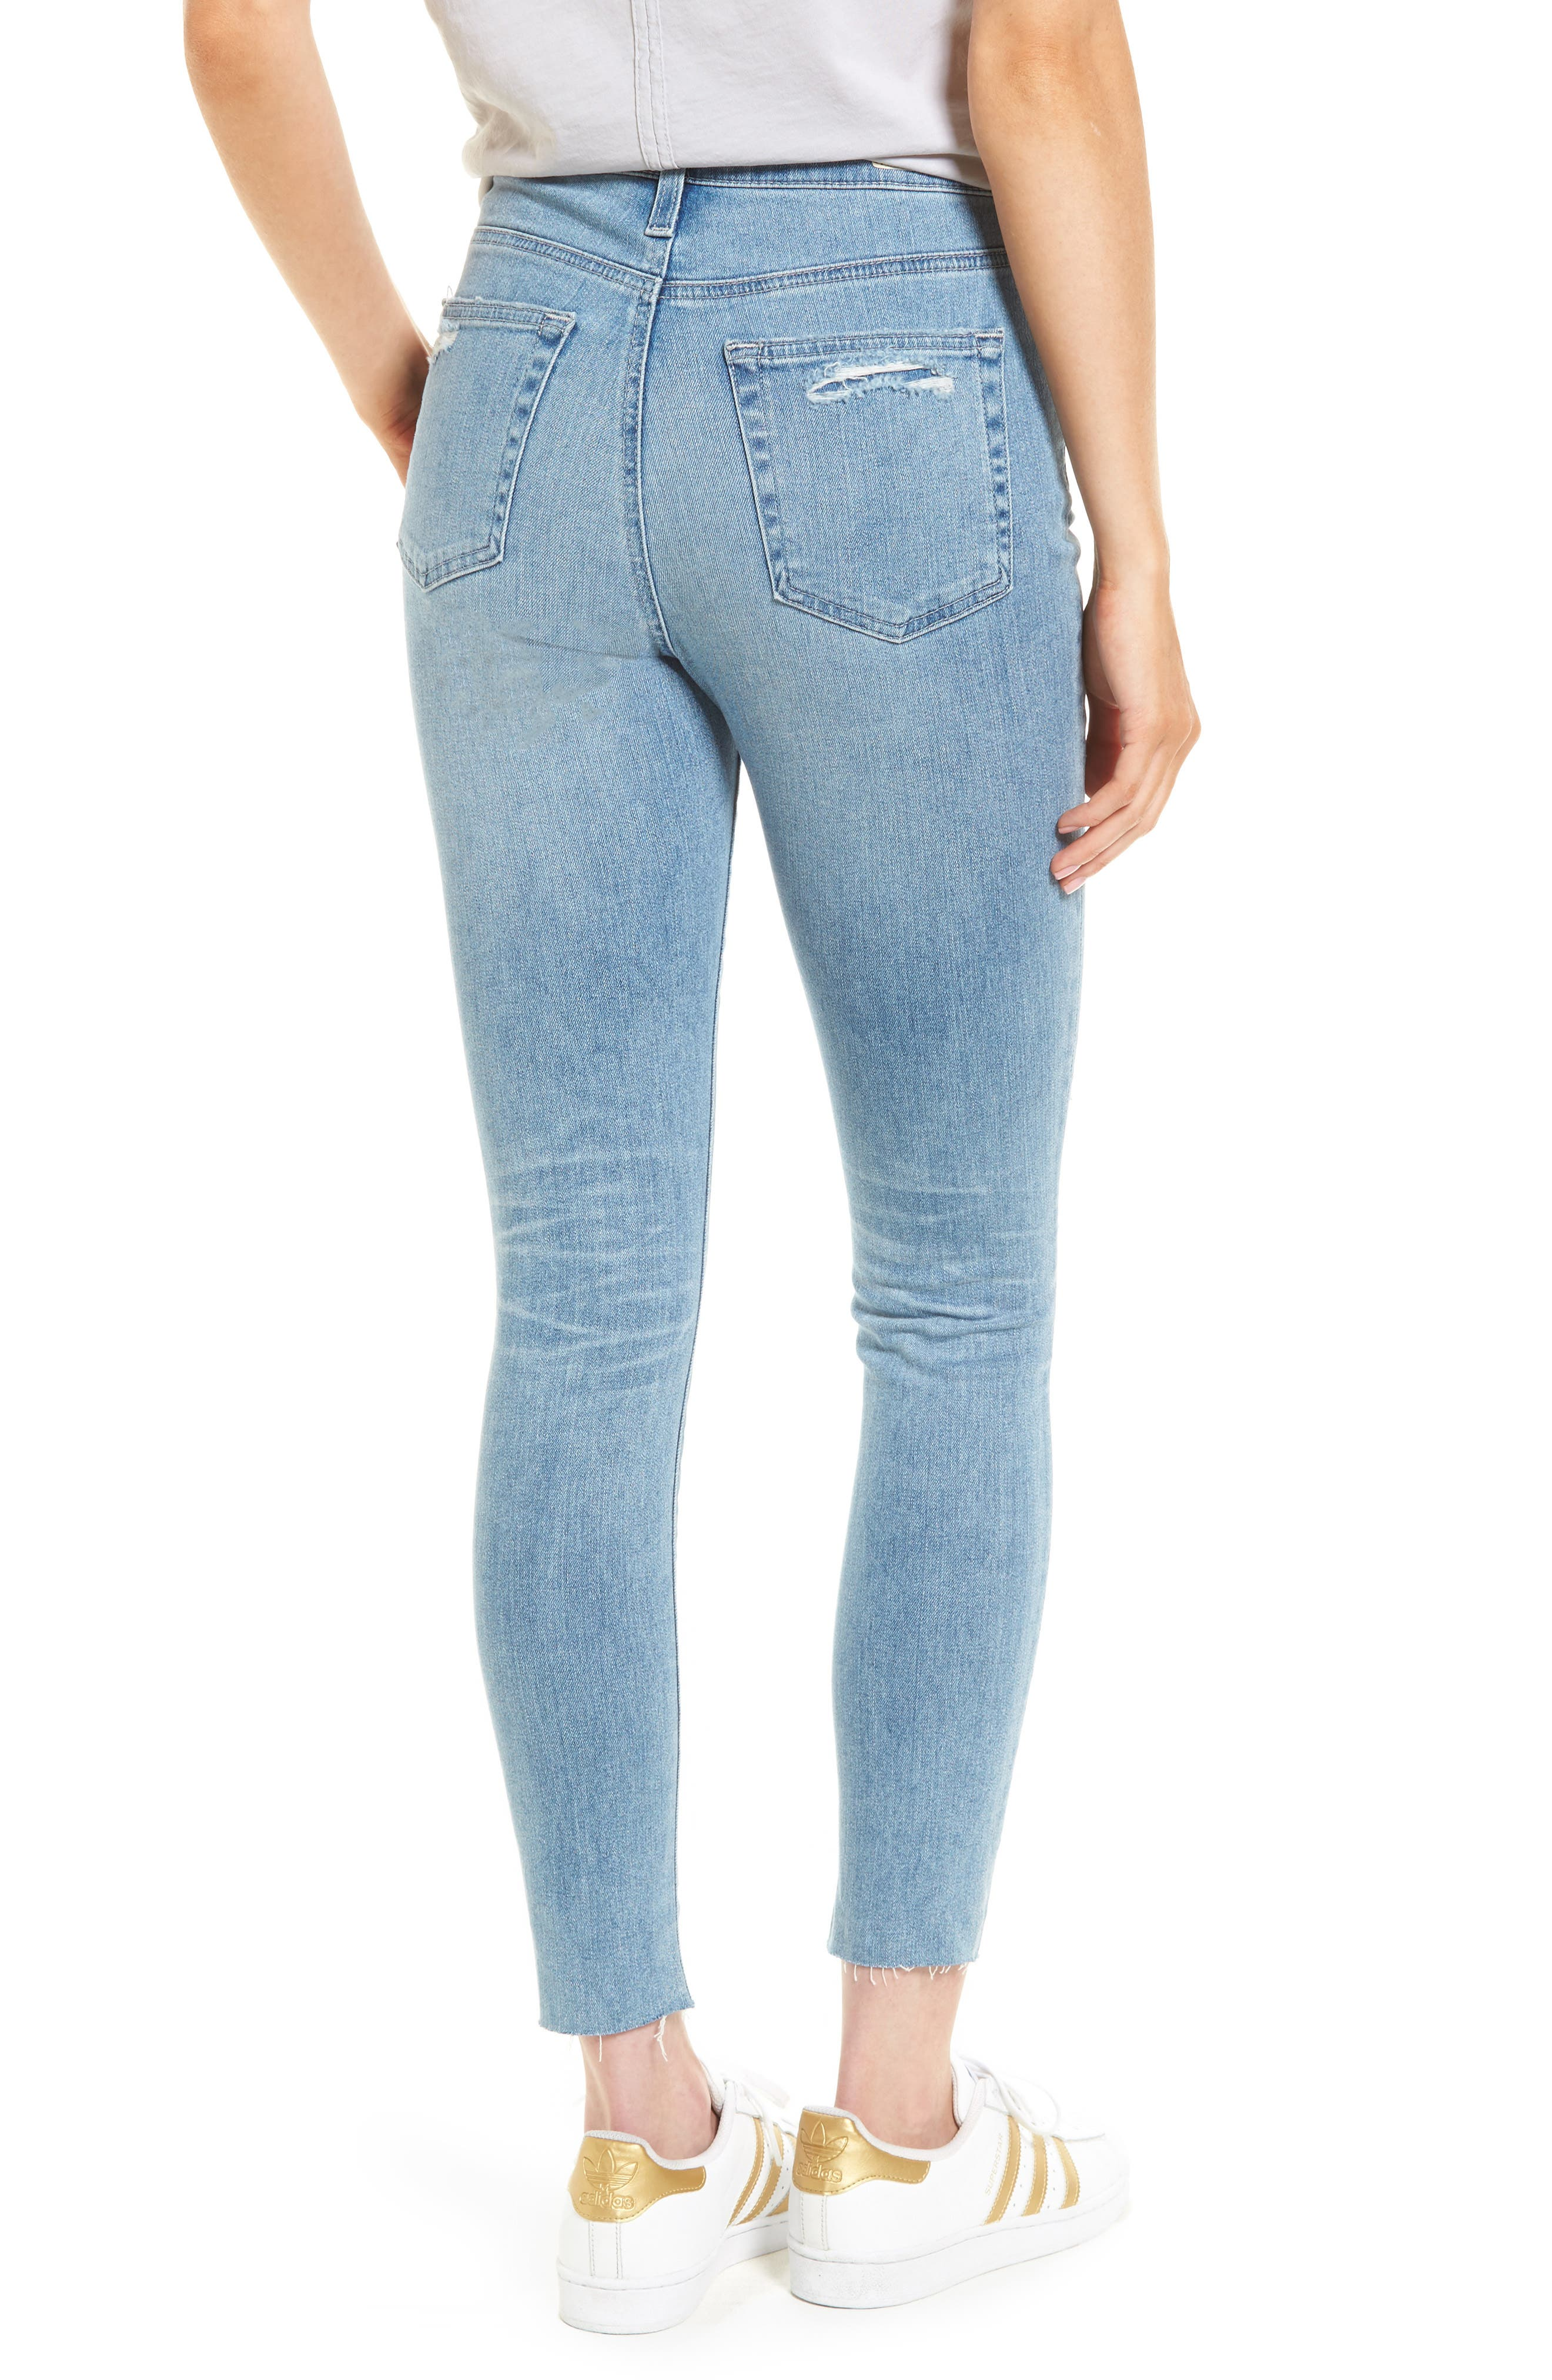 Mila High Waist Ankle Skinny Jeans,                             Alternate thumbnail 2, color,                             426